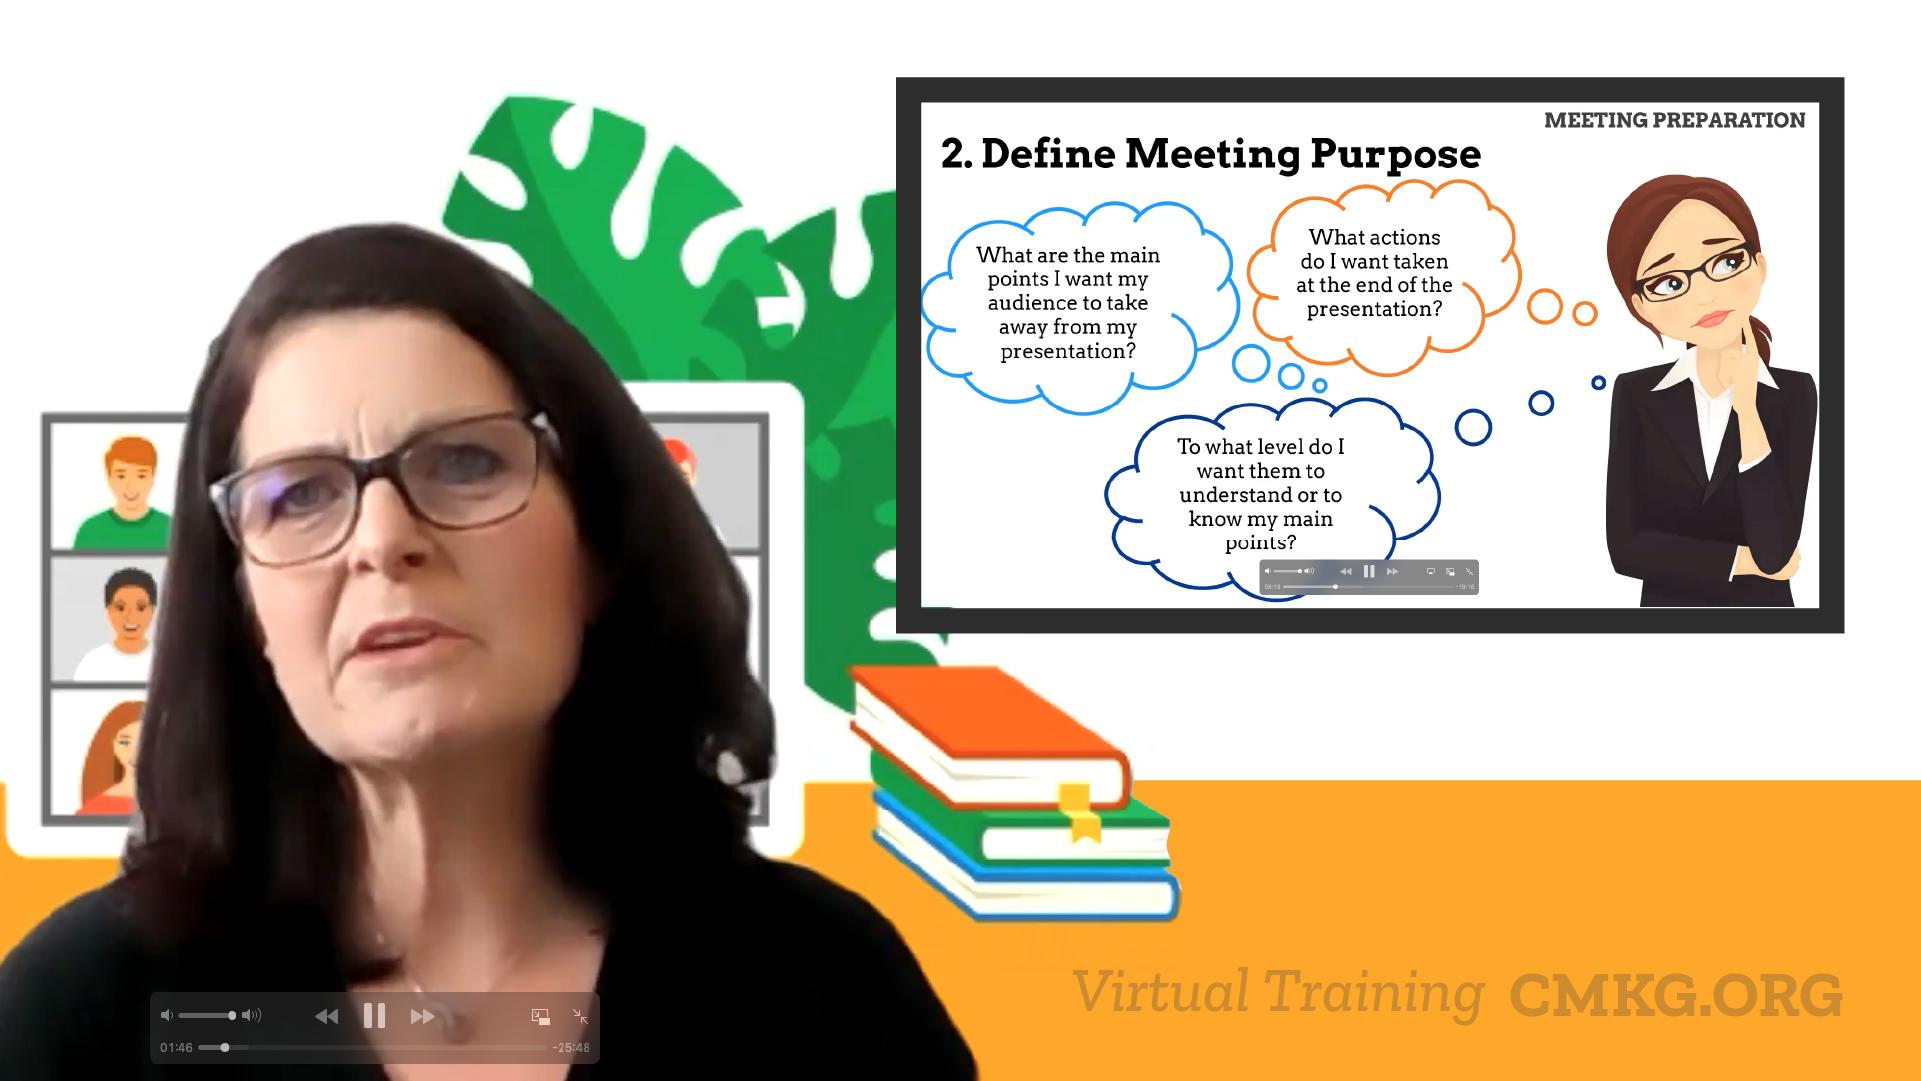 Sue Nicholls conducting Virtual Training Session